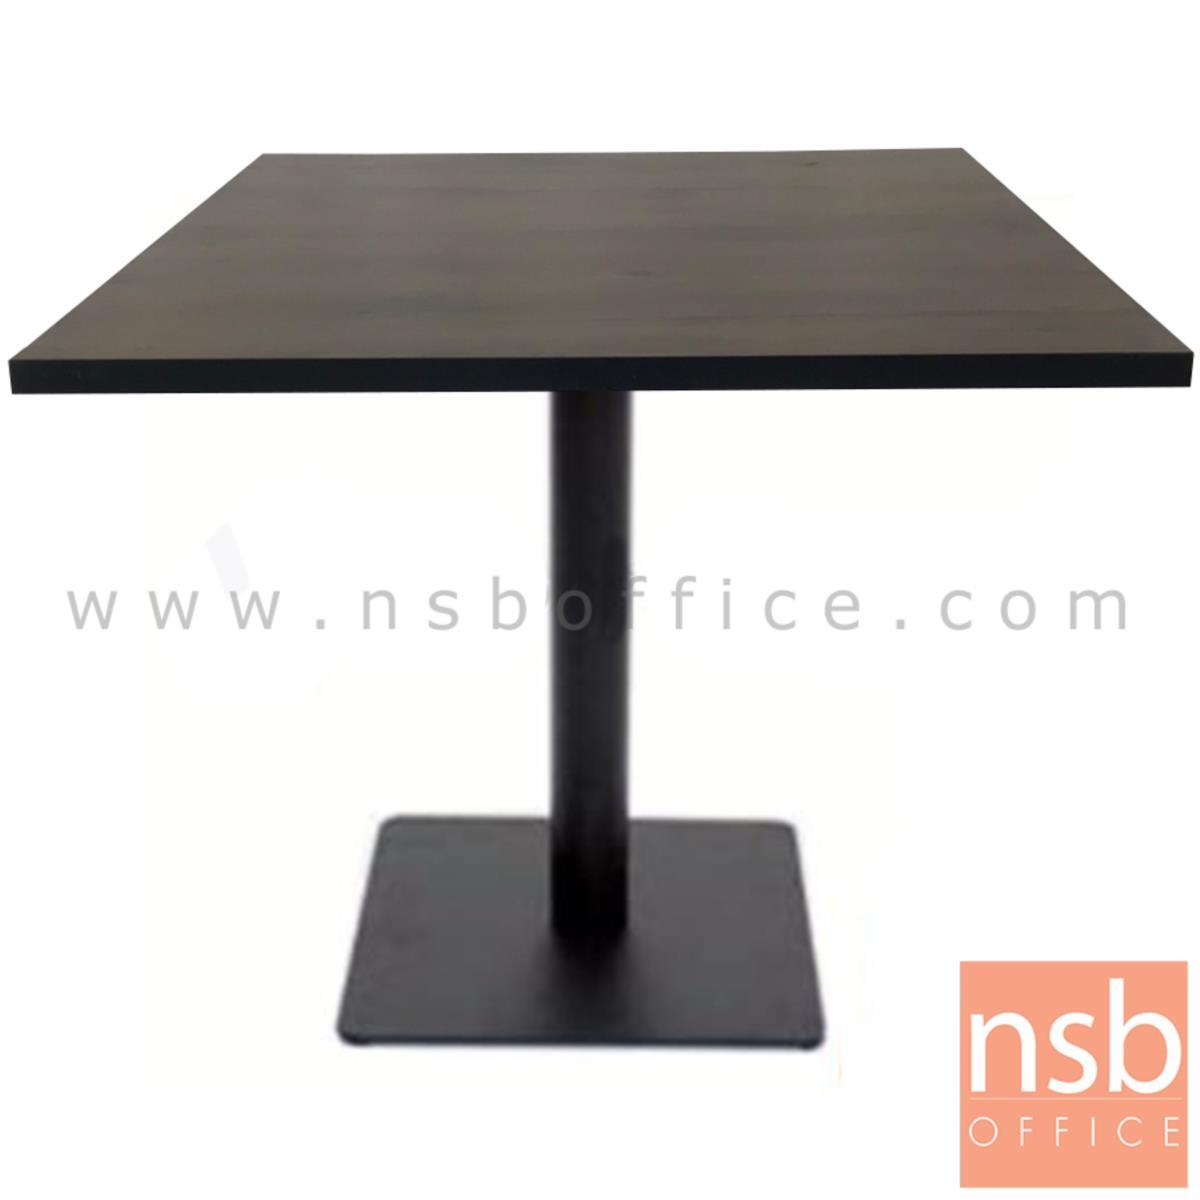 A14A173:โต๊ะบาร์ COFFEE รุ่น H-CF30 ขนาด 60W ,70W ,80W ,60Di ,70Di ,80Di cm.   ขาเหล็กฐานเหลี่ยมแบนสีดำ